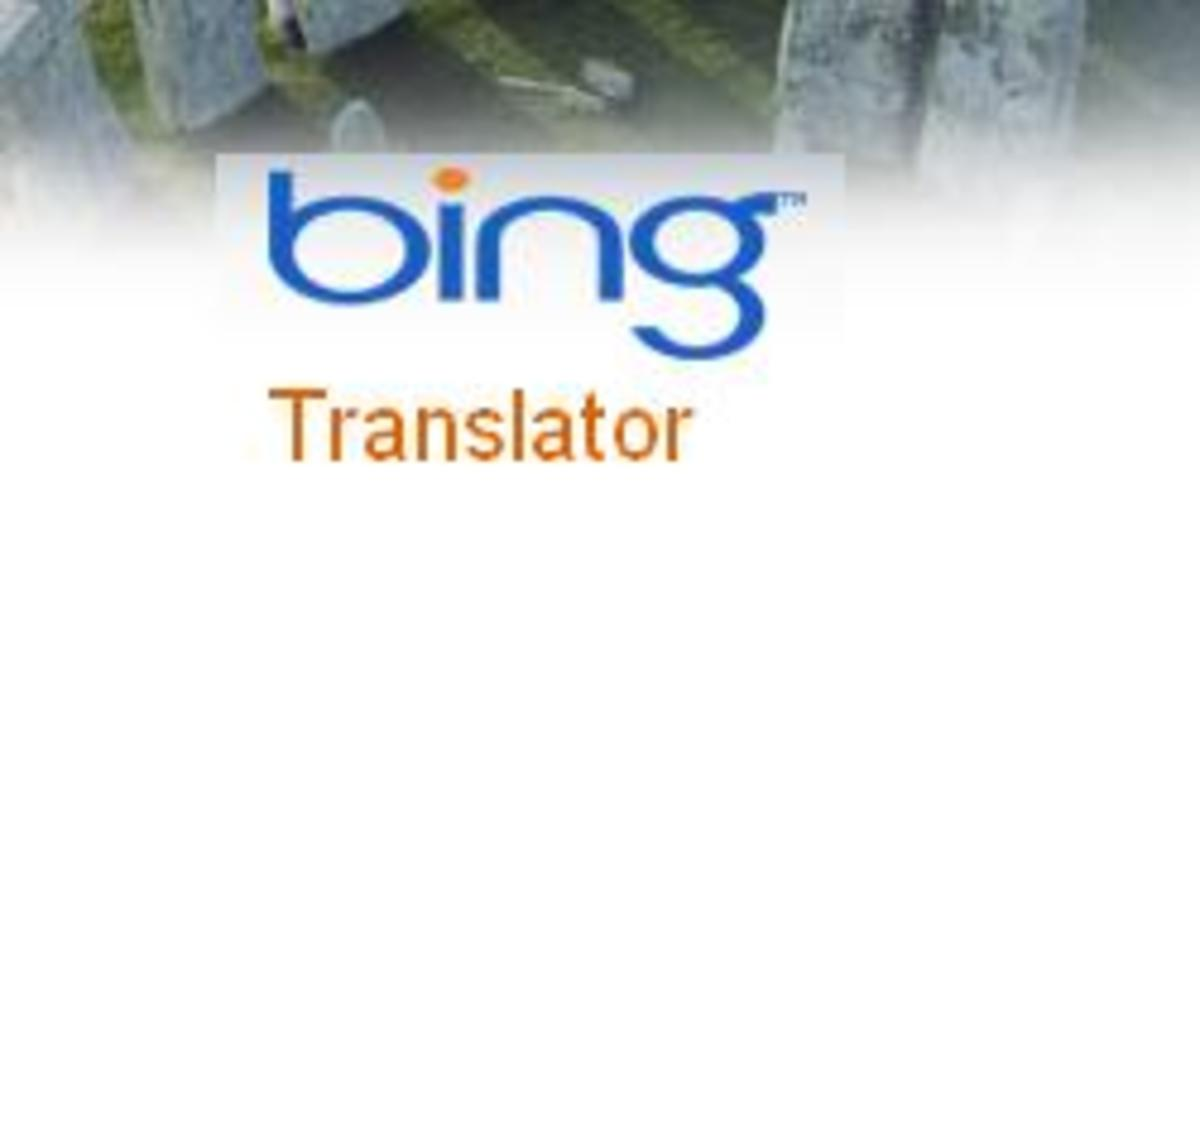 Bing Translator - Microsoft's Online Language Translation Service